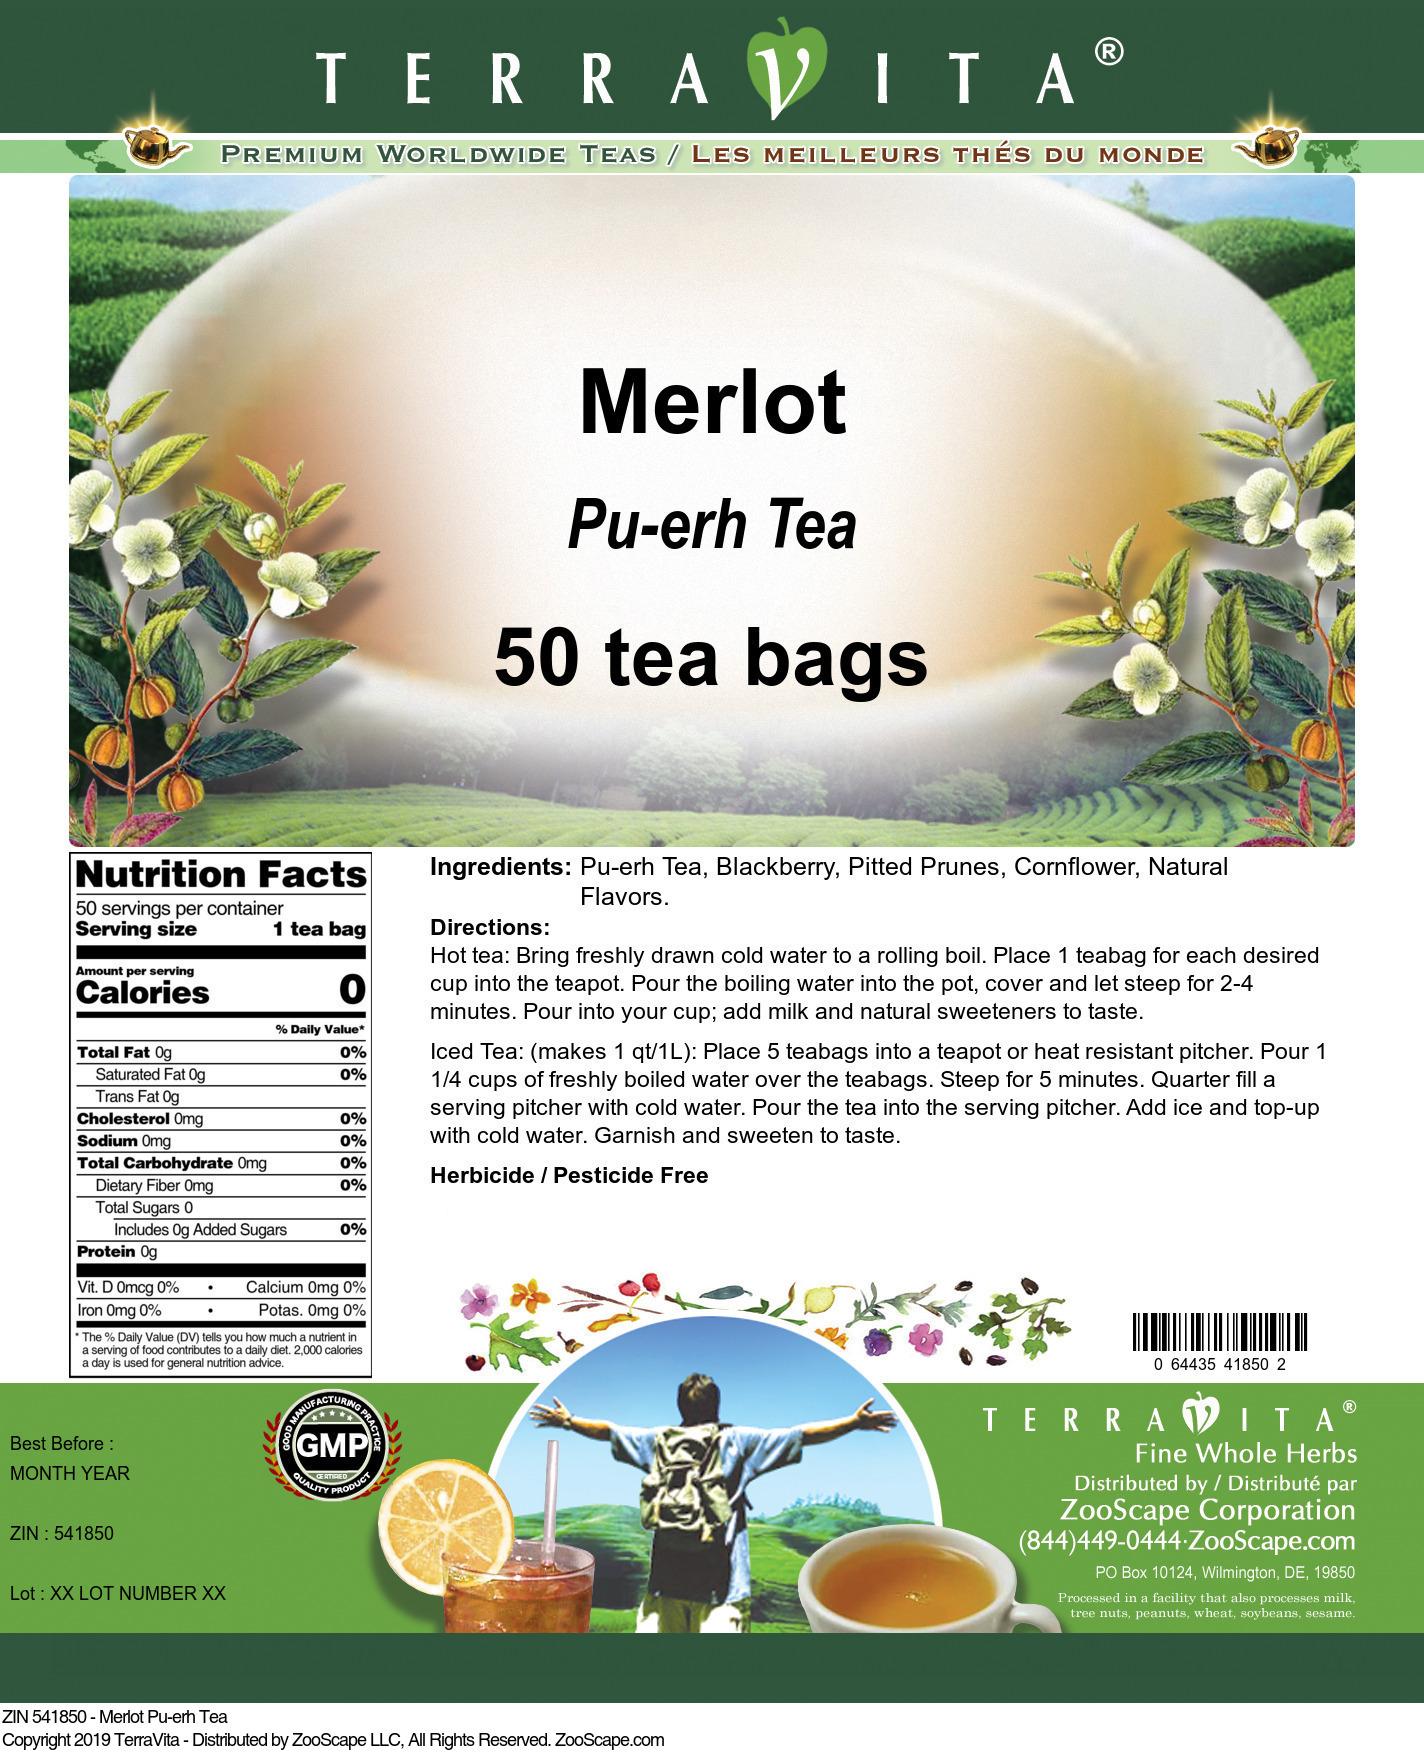 Merlot Pu-erh Tea